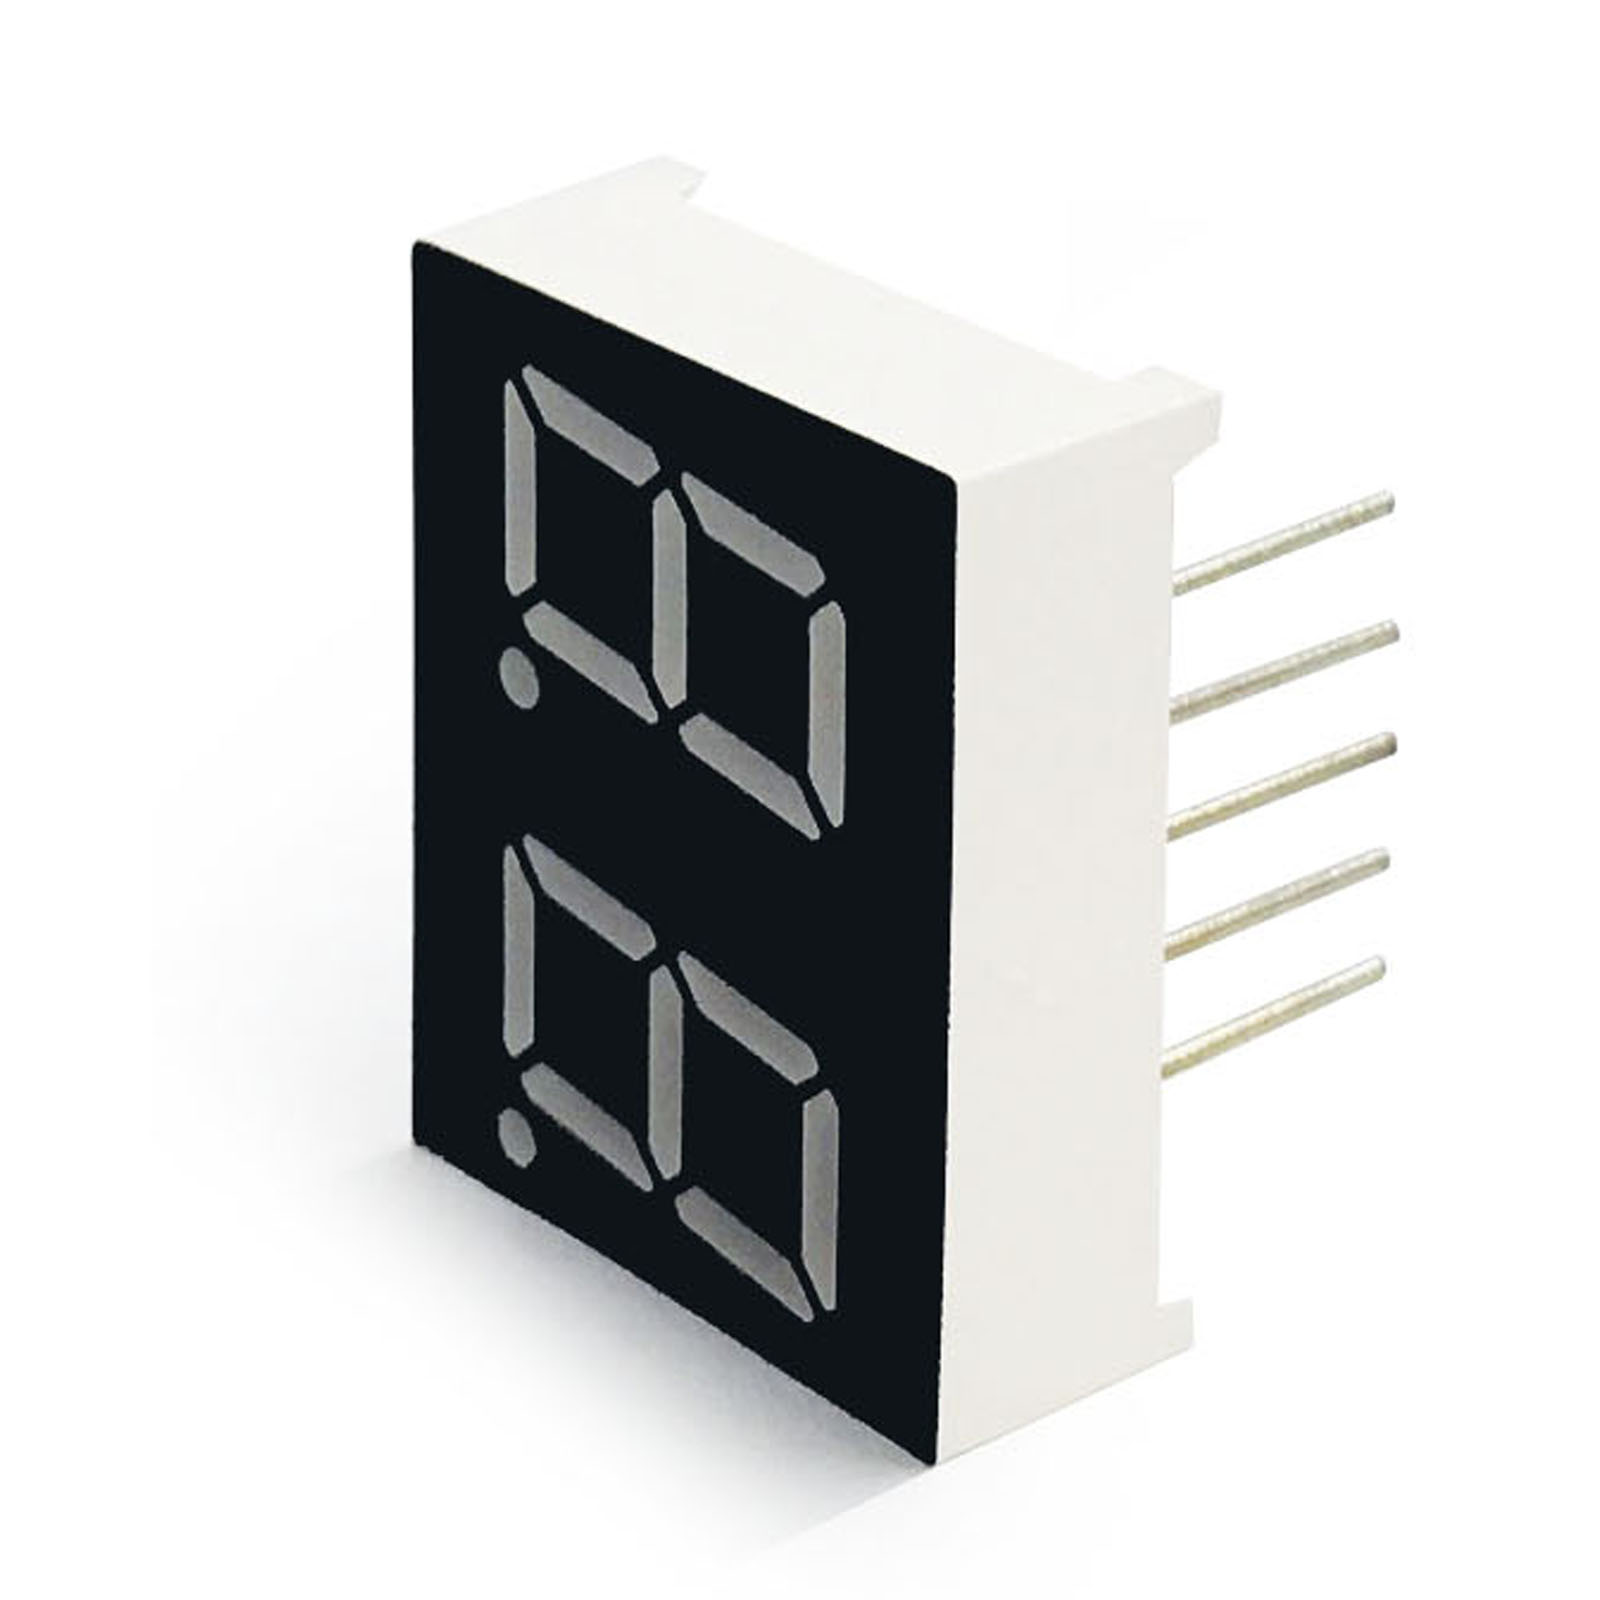 MCIGICM 100pcs Common Anode 2 Bit Digital Tube 0.4